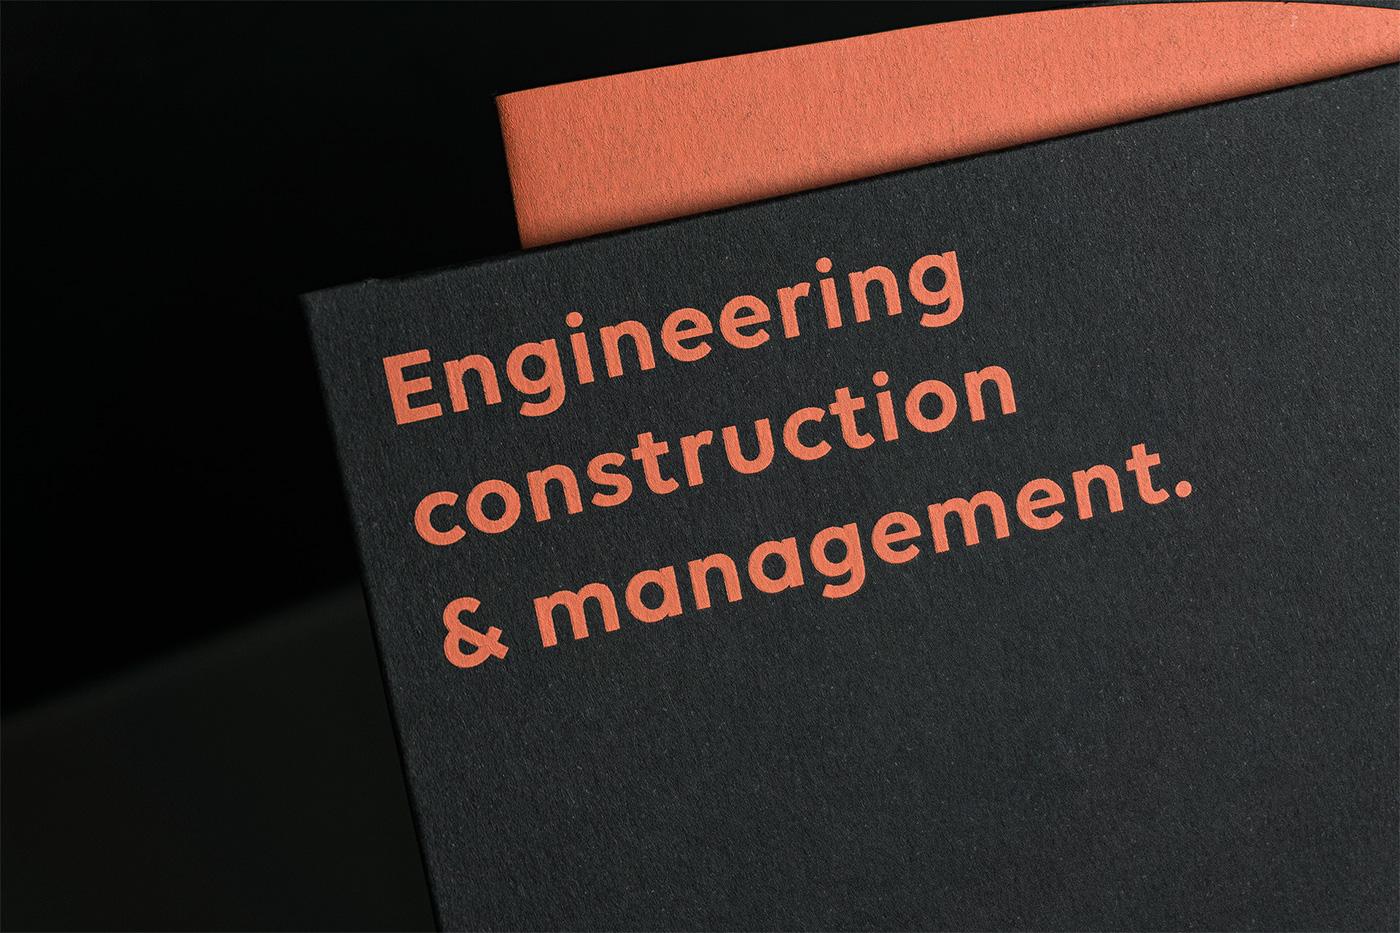 Engineering  management construction angelosbotsis visual identity Civil Engineer athens Greece visuals